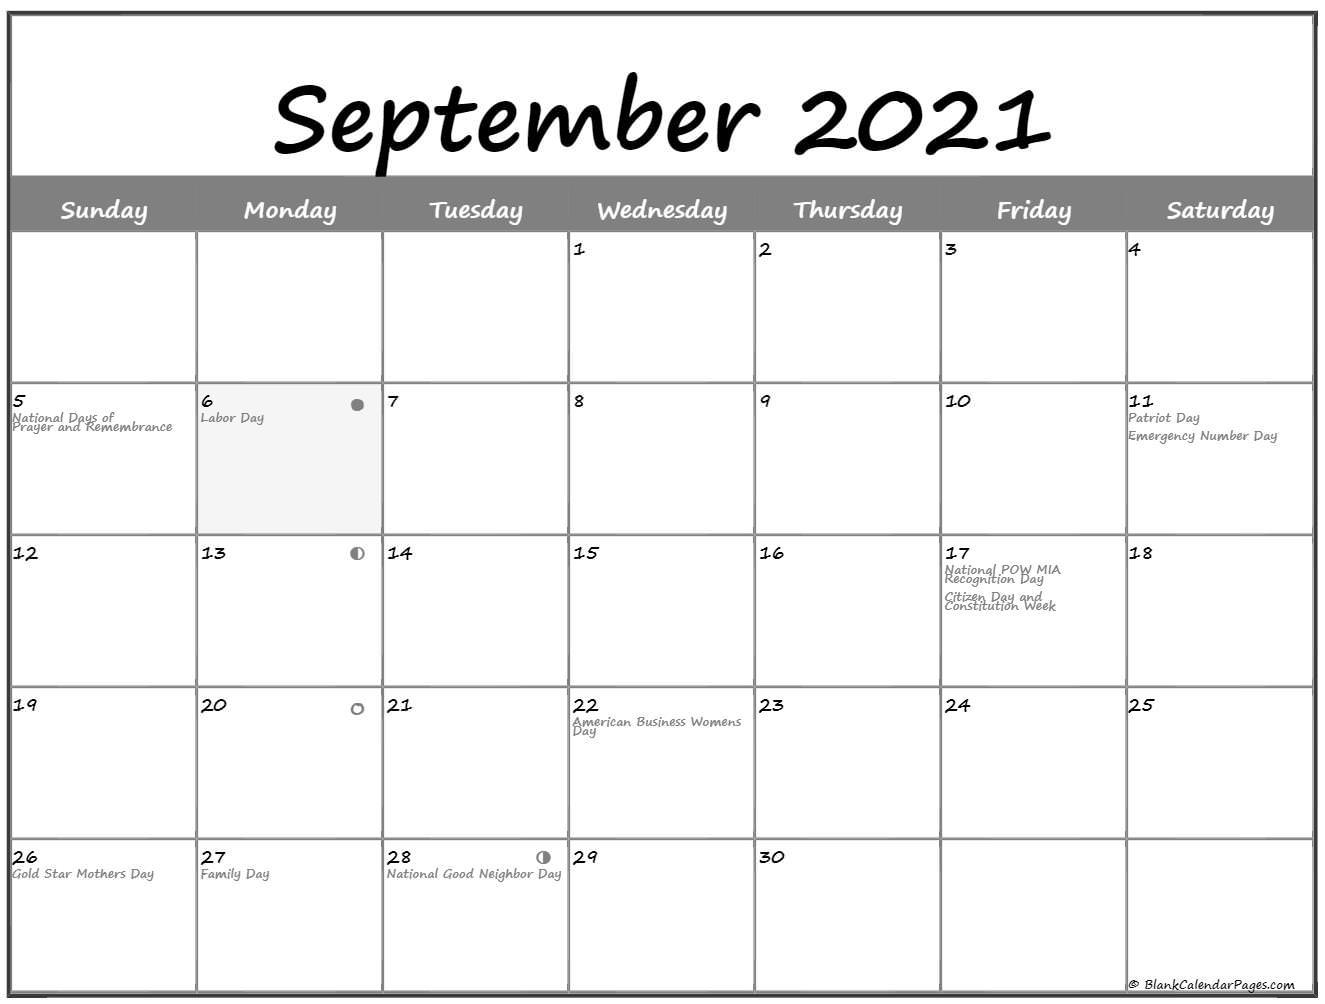 September 2021 Lunar Calendar   Moon Phase Calendar September 2020 To March 2021 Calendar